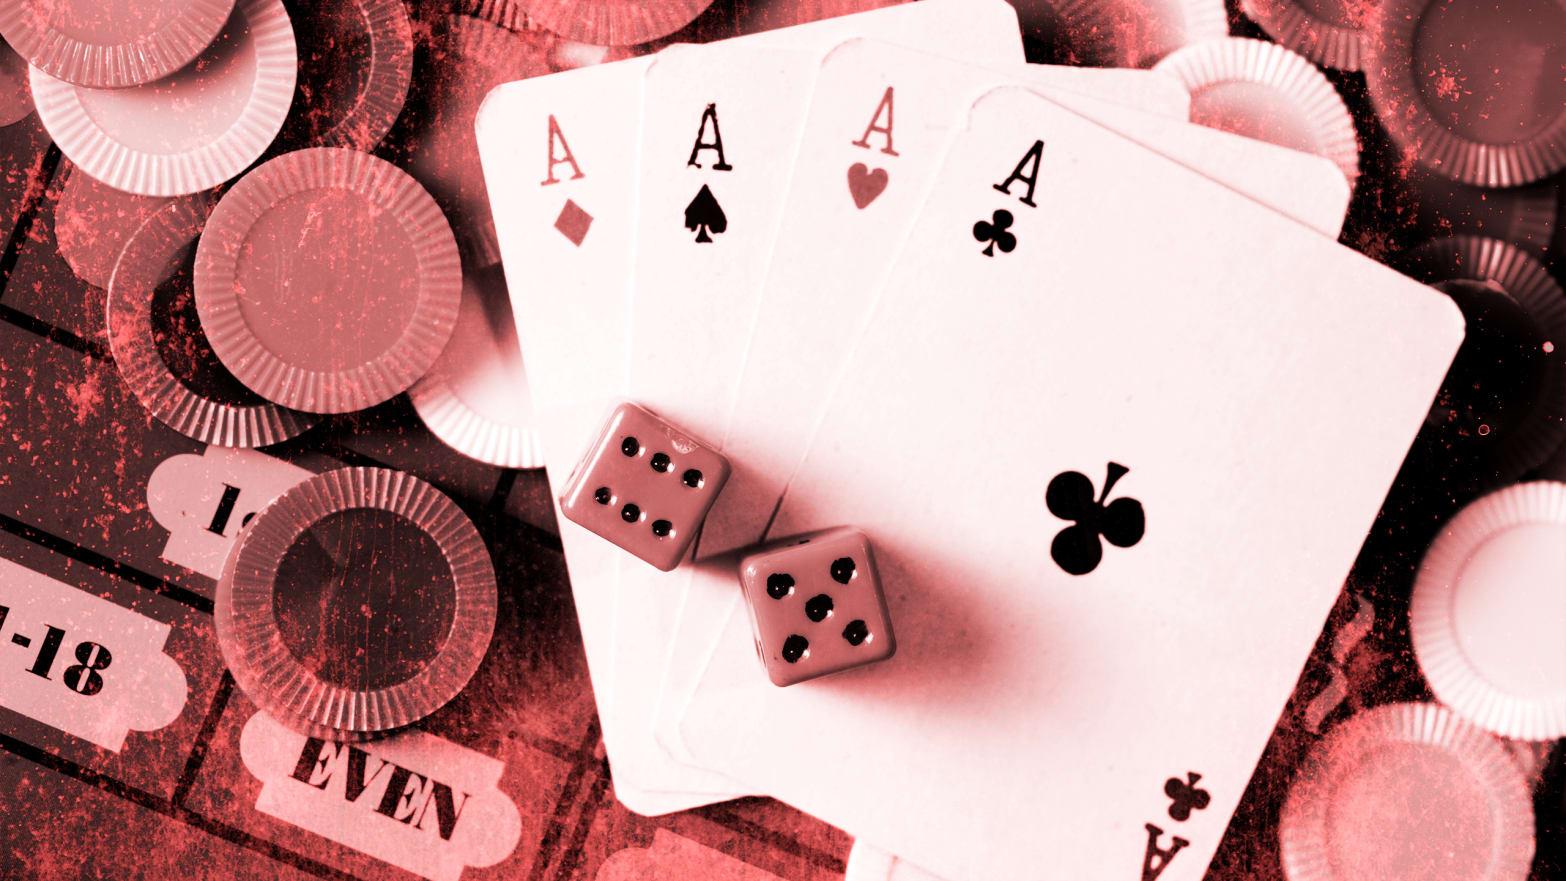 Poker camp 2016